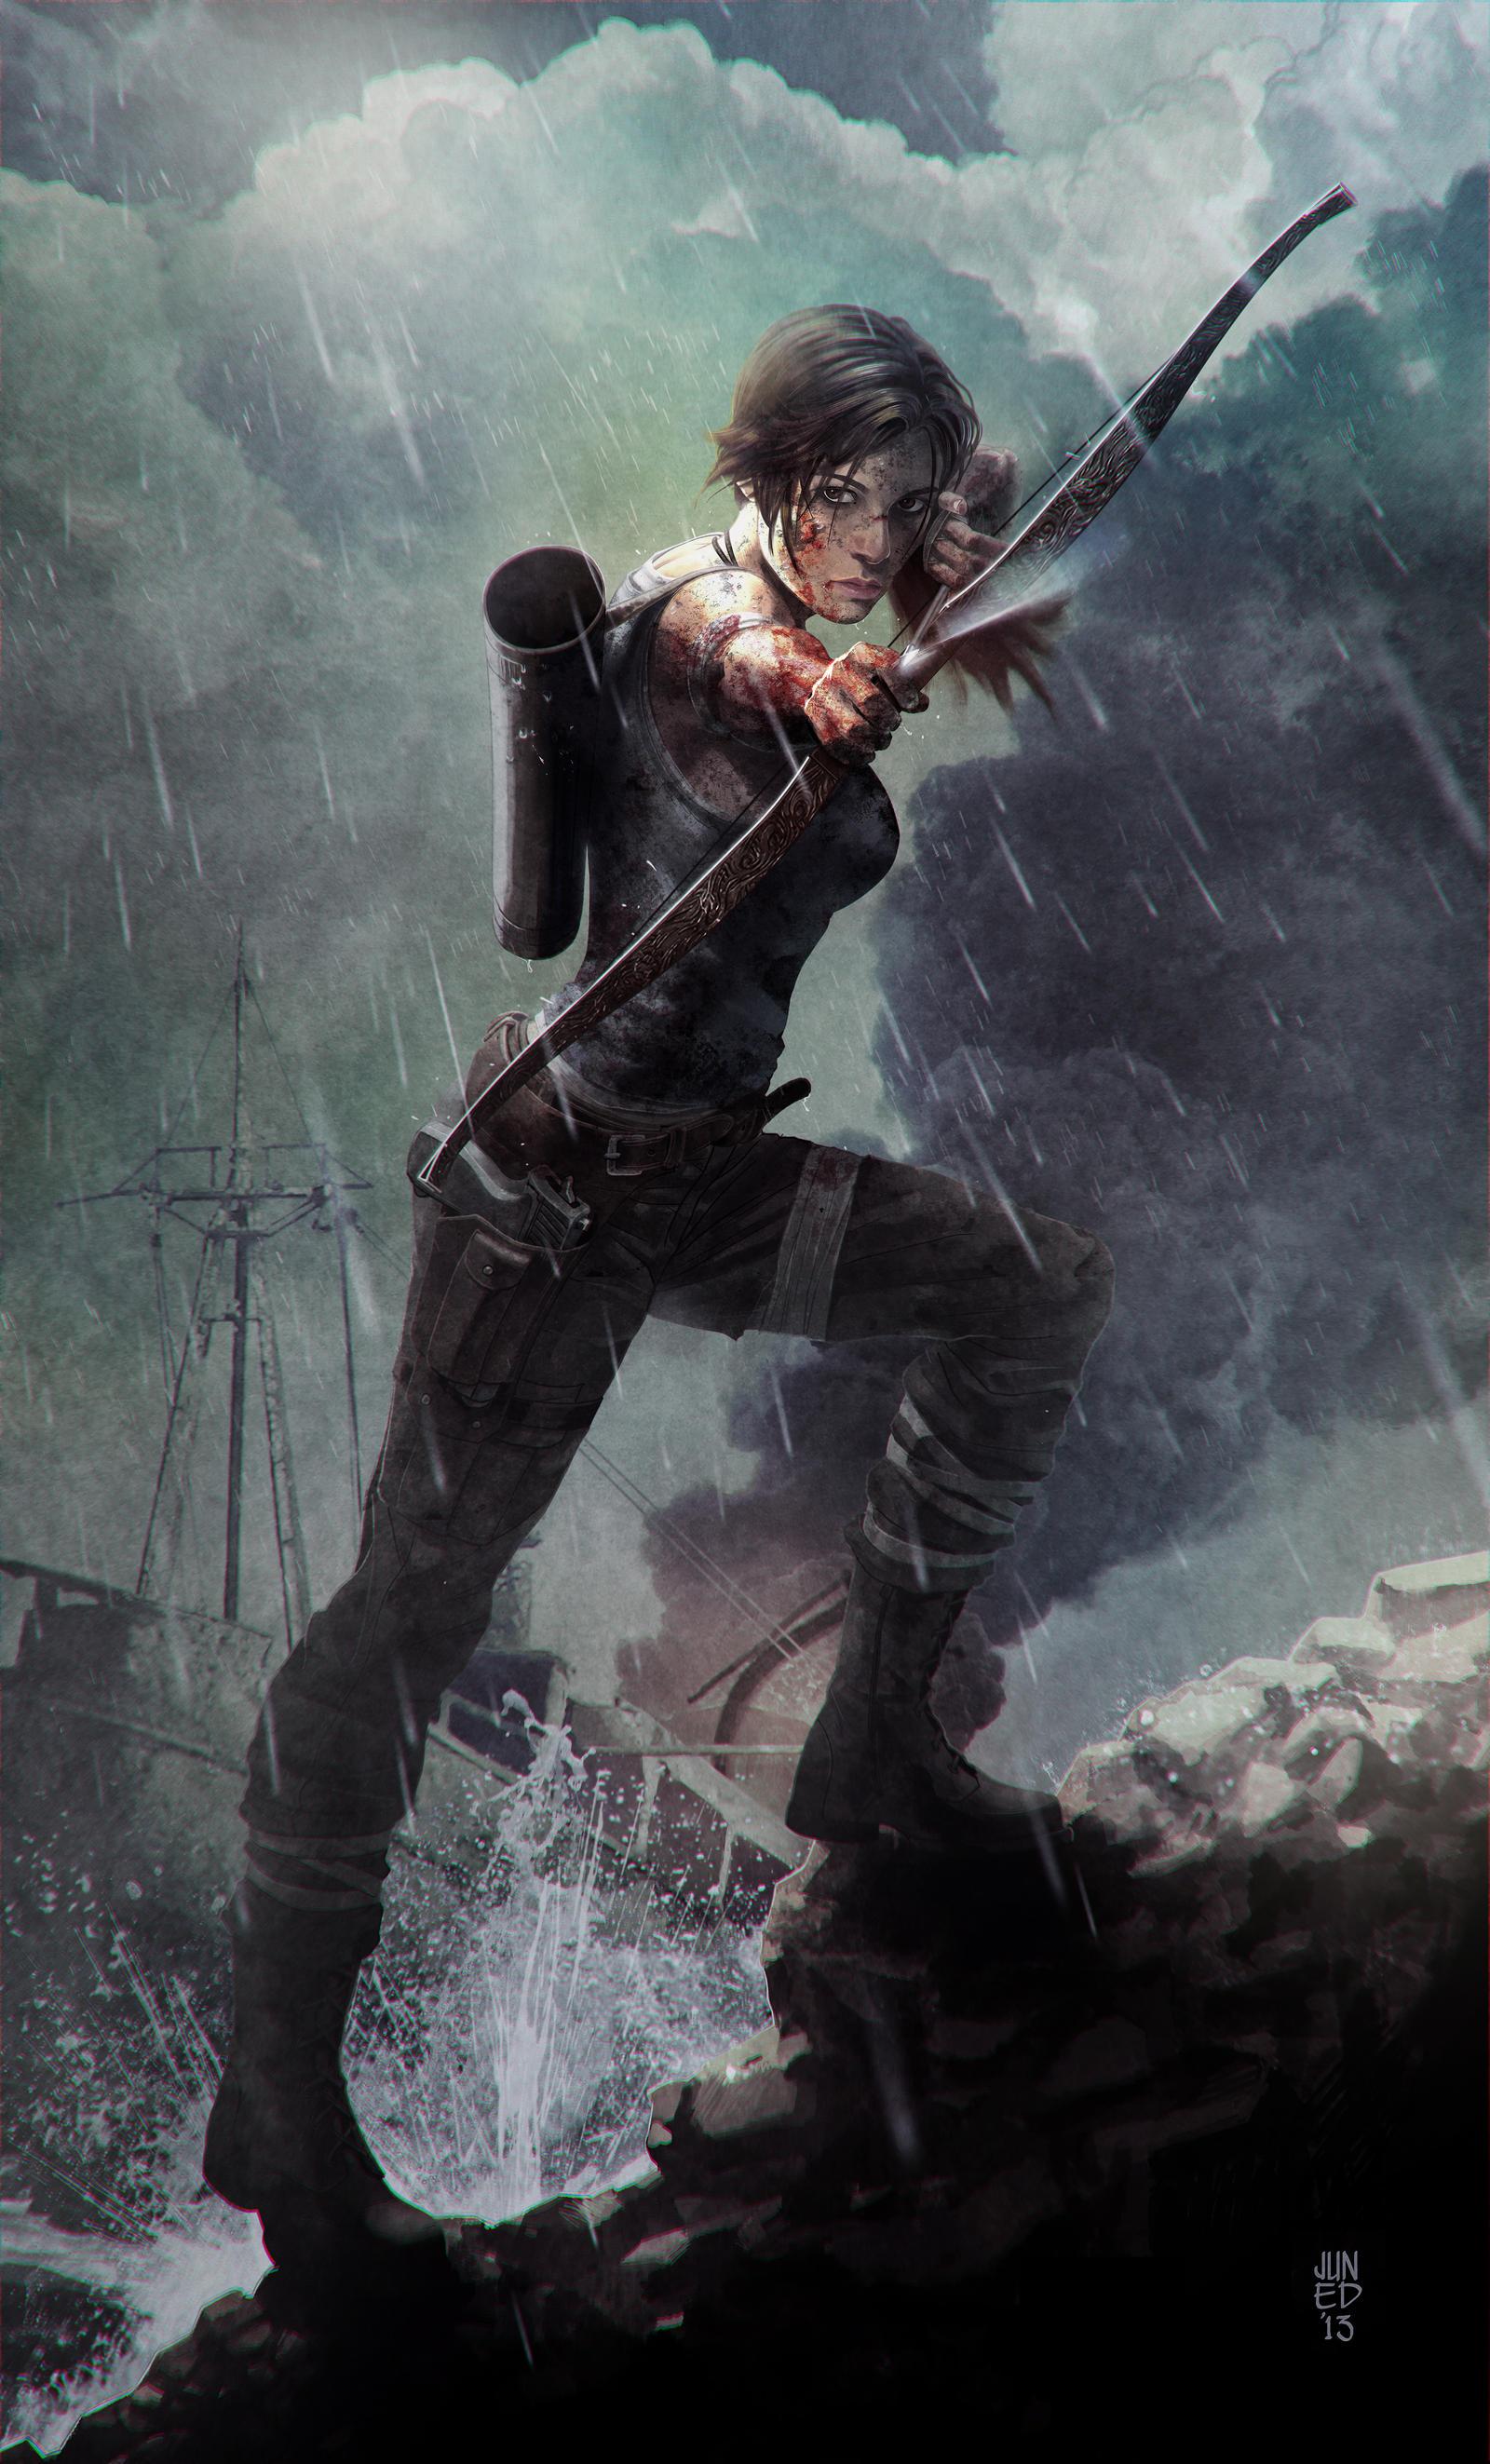 The Last Arrow II by JUNAIDI